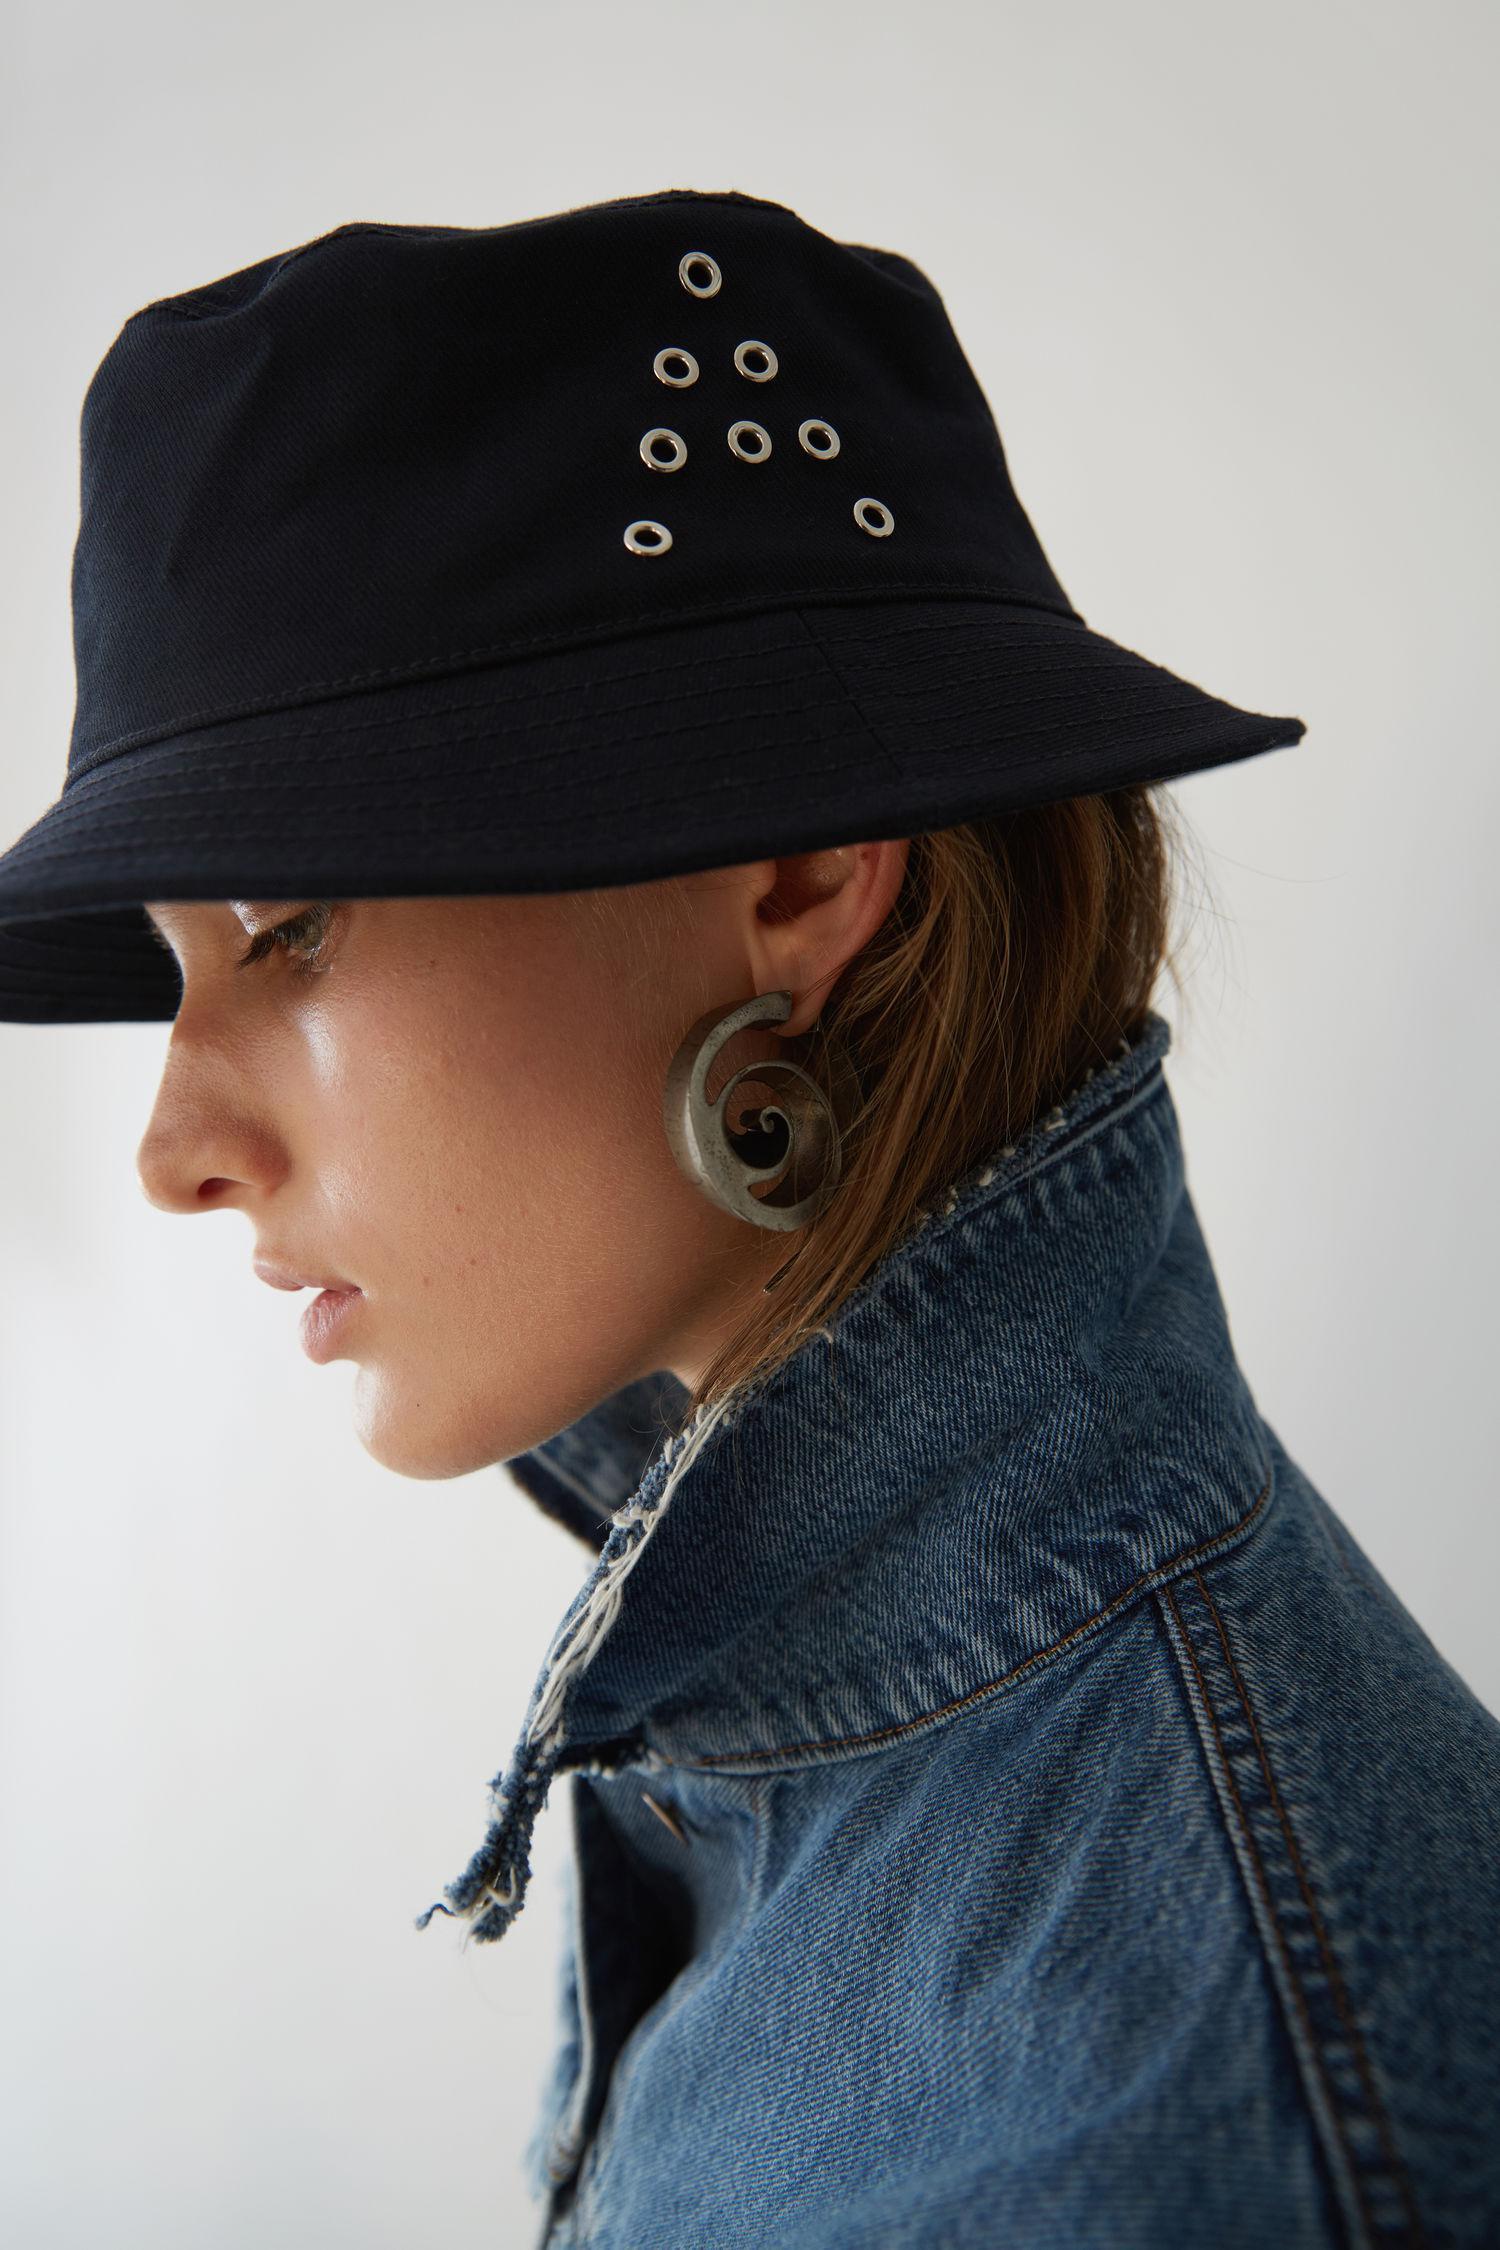 Lyst - Acne Studios Bucket Hat navy in Blue 4127a5952f74